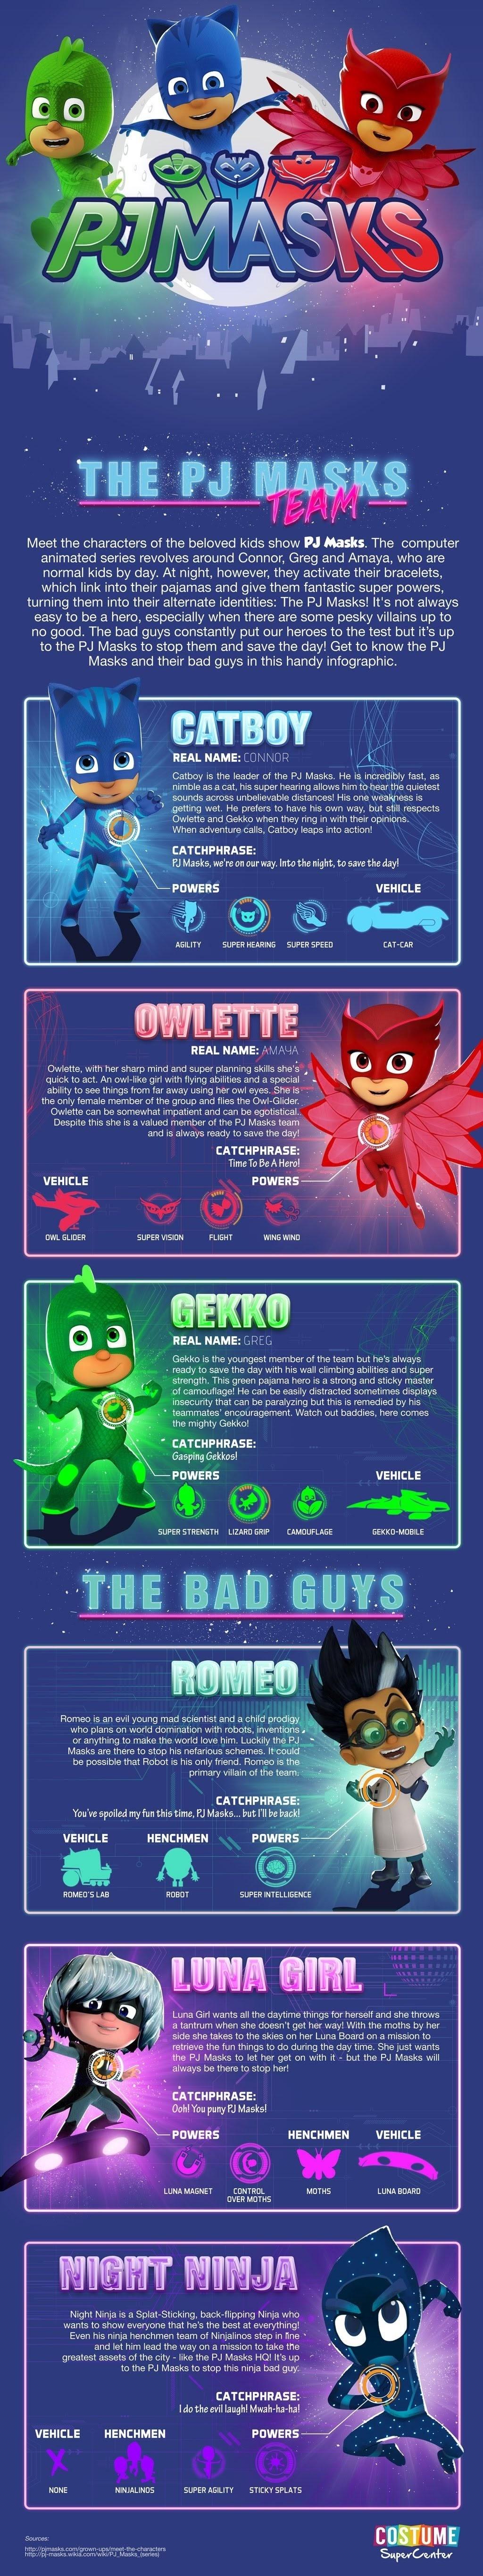 Meet The PJ Masks #infographic